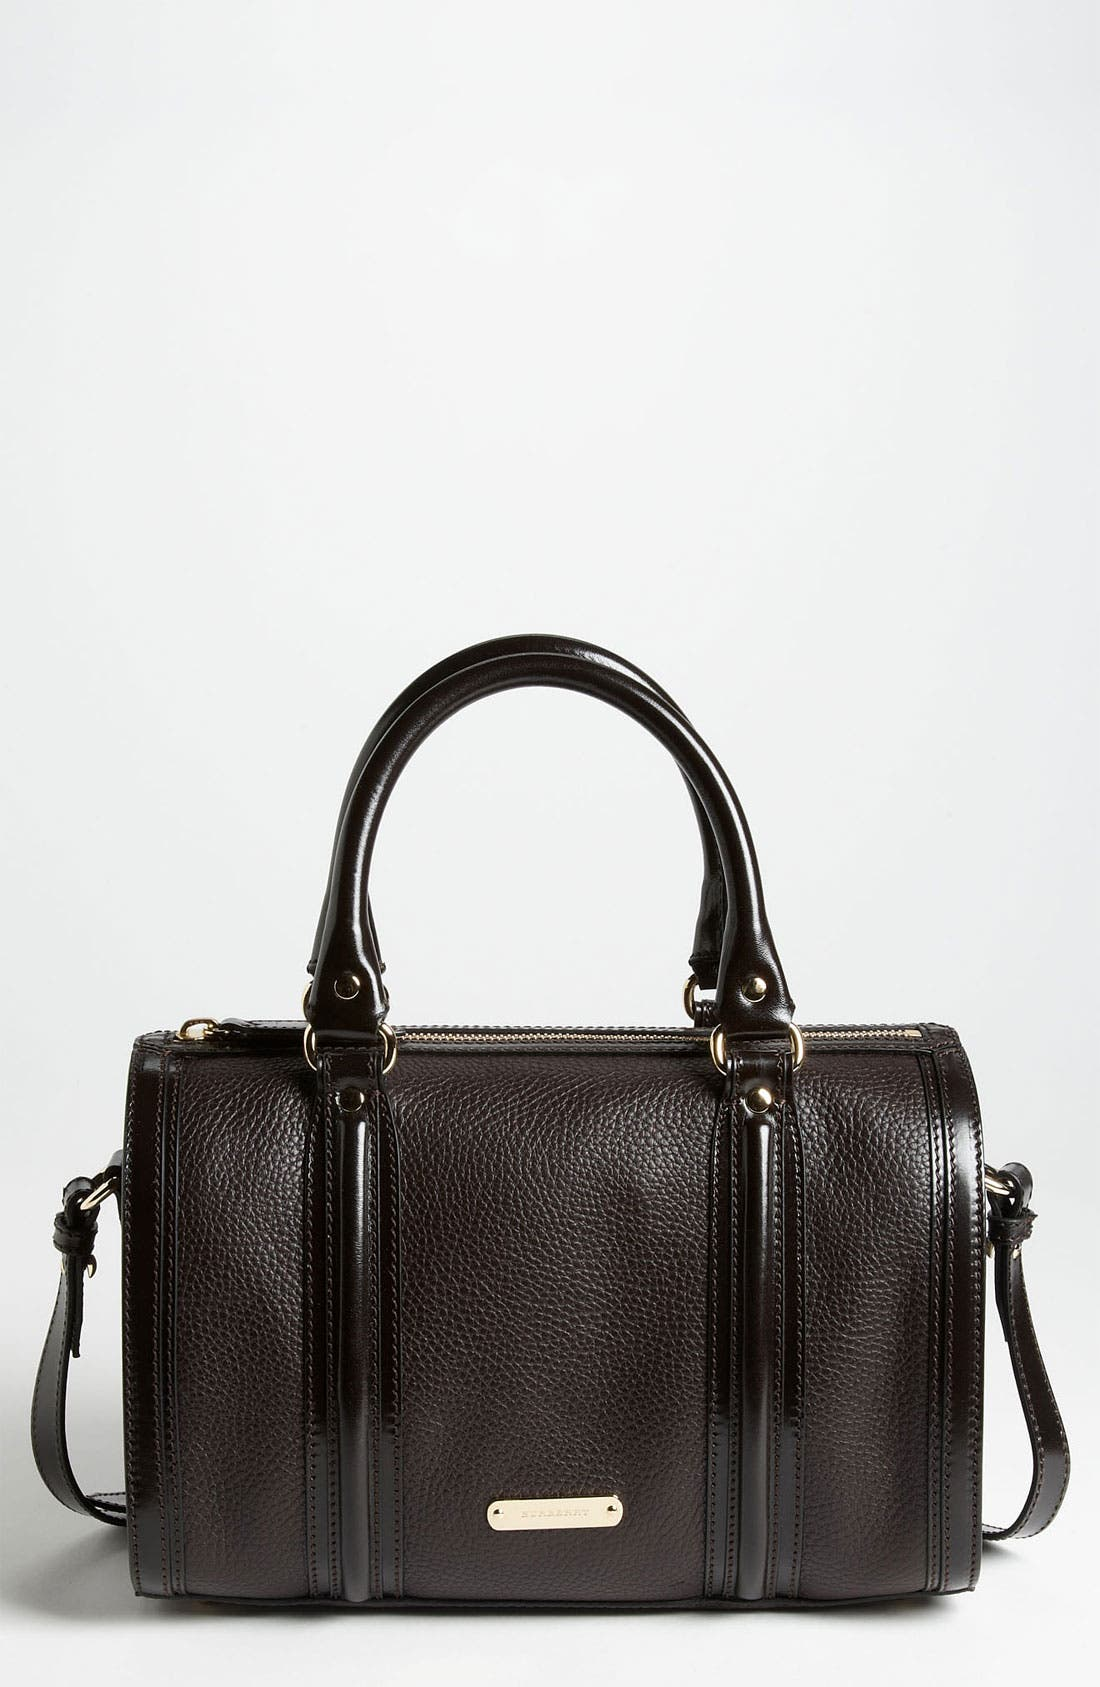 Main Image - Burberry 'London Grainy' Leather Satchel, Medium